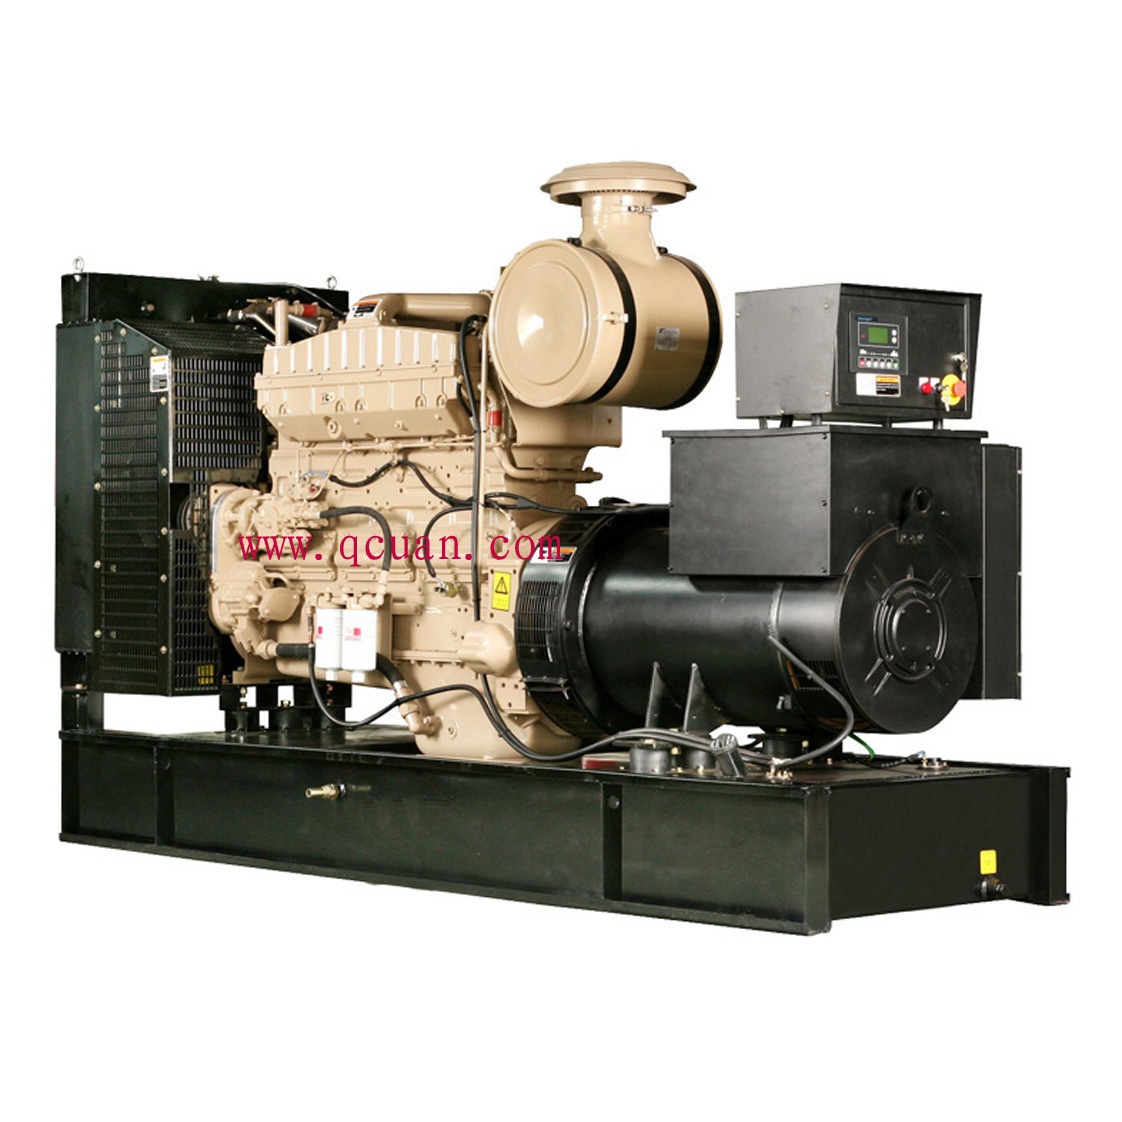 Groupes lectrog nes diesel de 330kva 260kw cummins nta855 g2 groupes lec - Groupe electrogene triphase diesel 10 kw ...